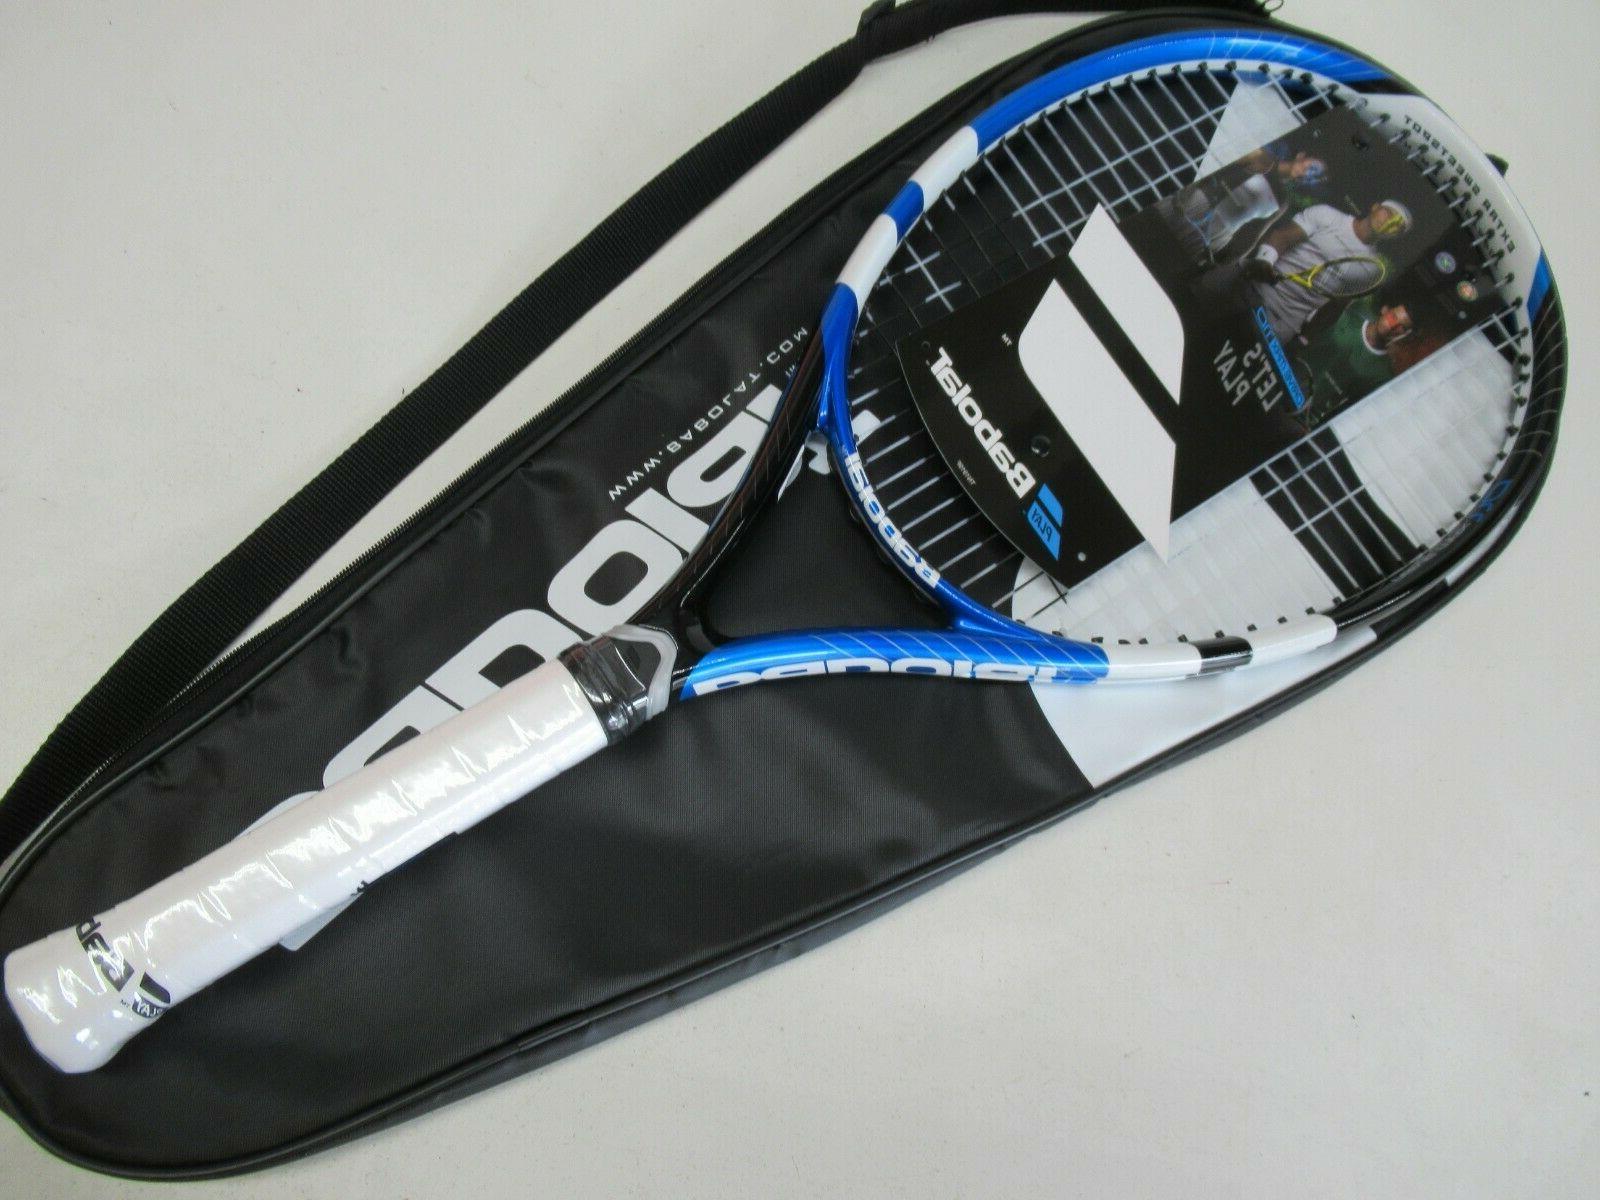 new drive max 110 tennis racquet 4